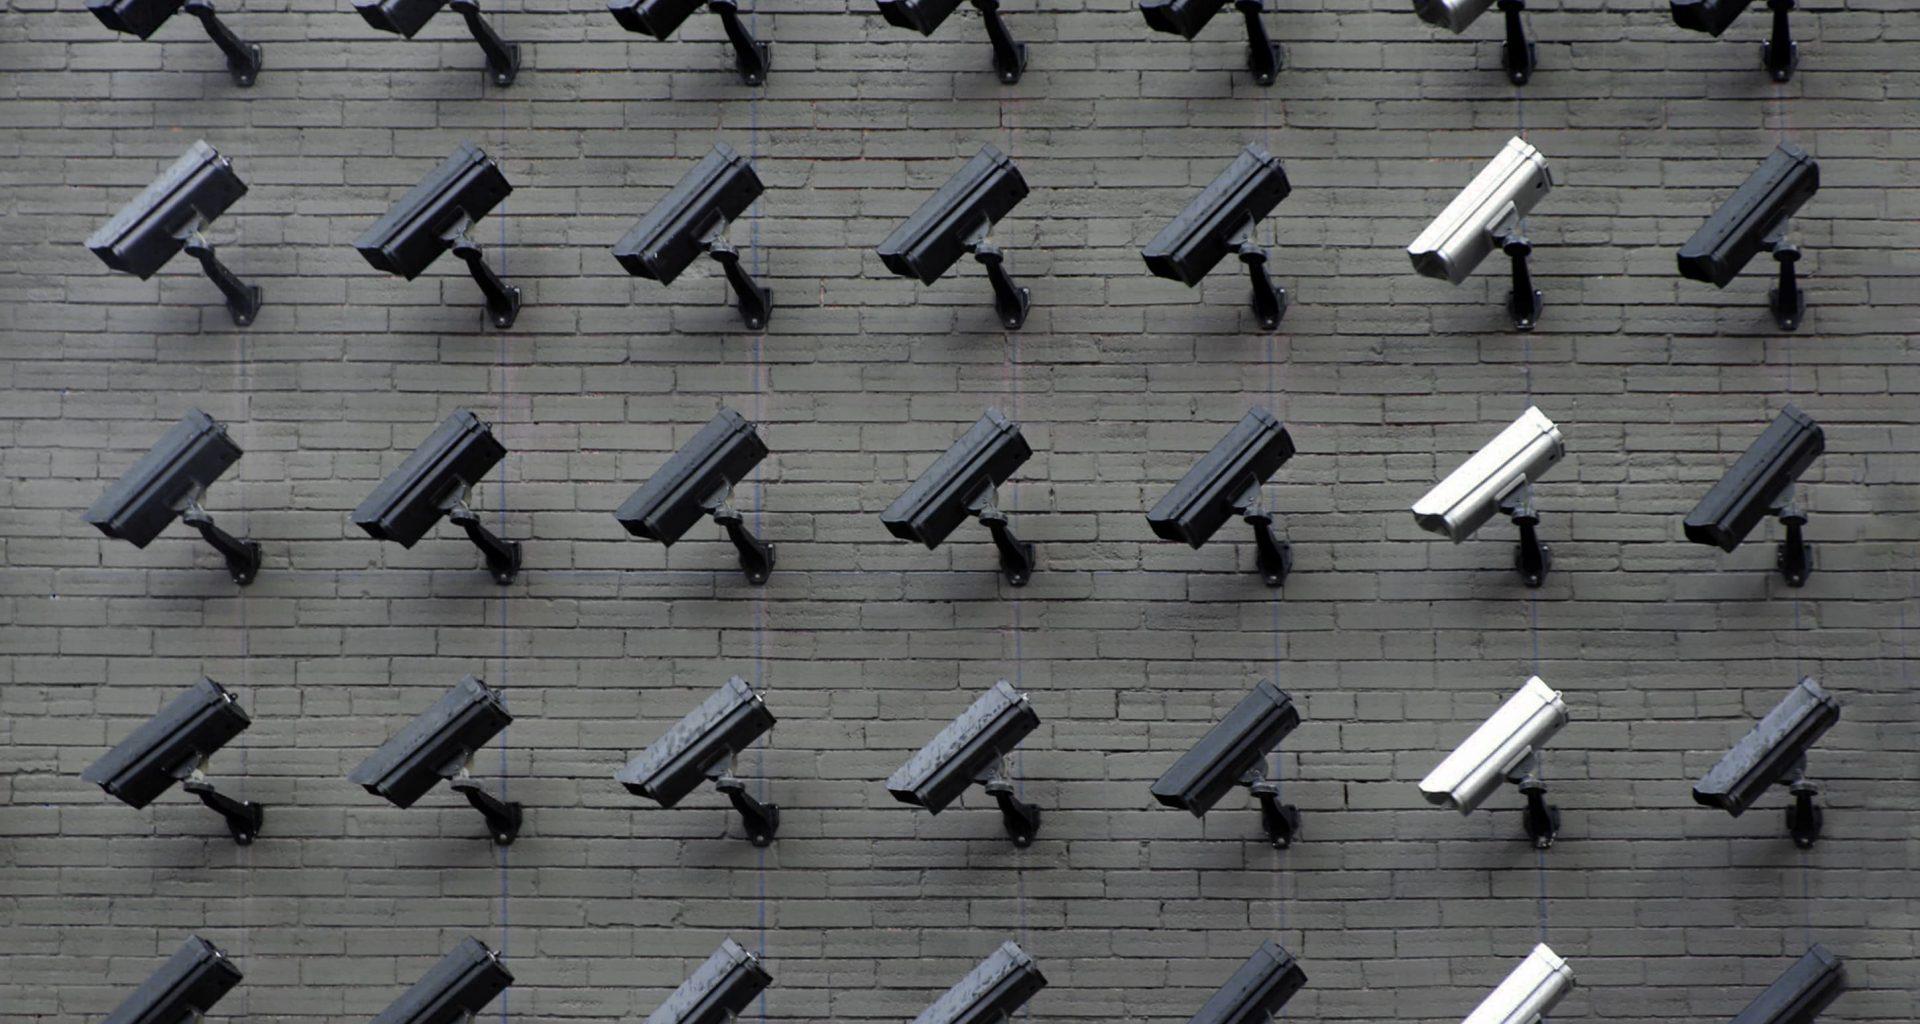 cctv cameras on a wall